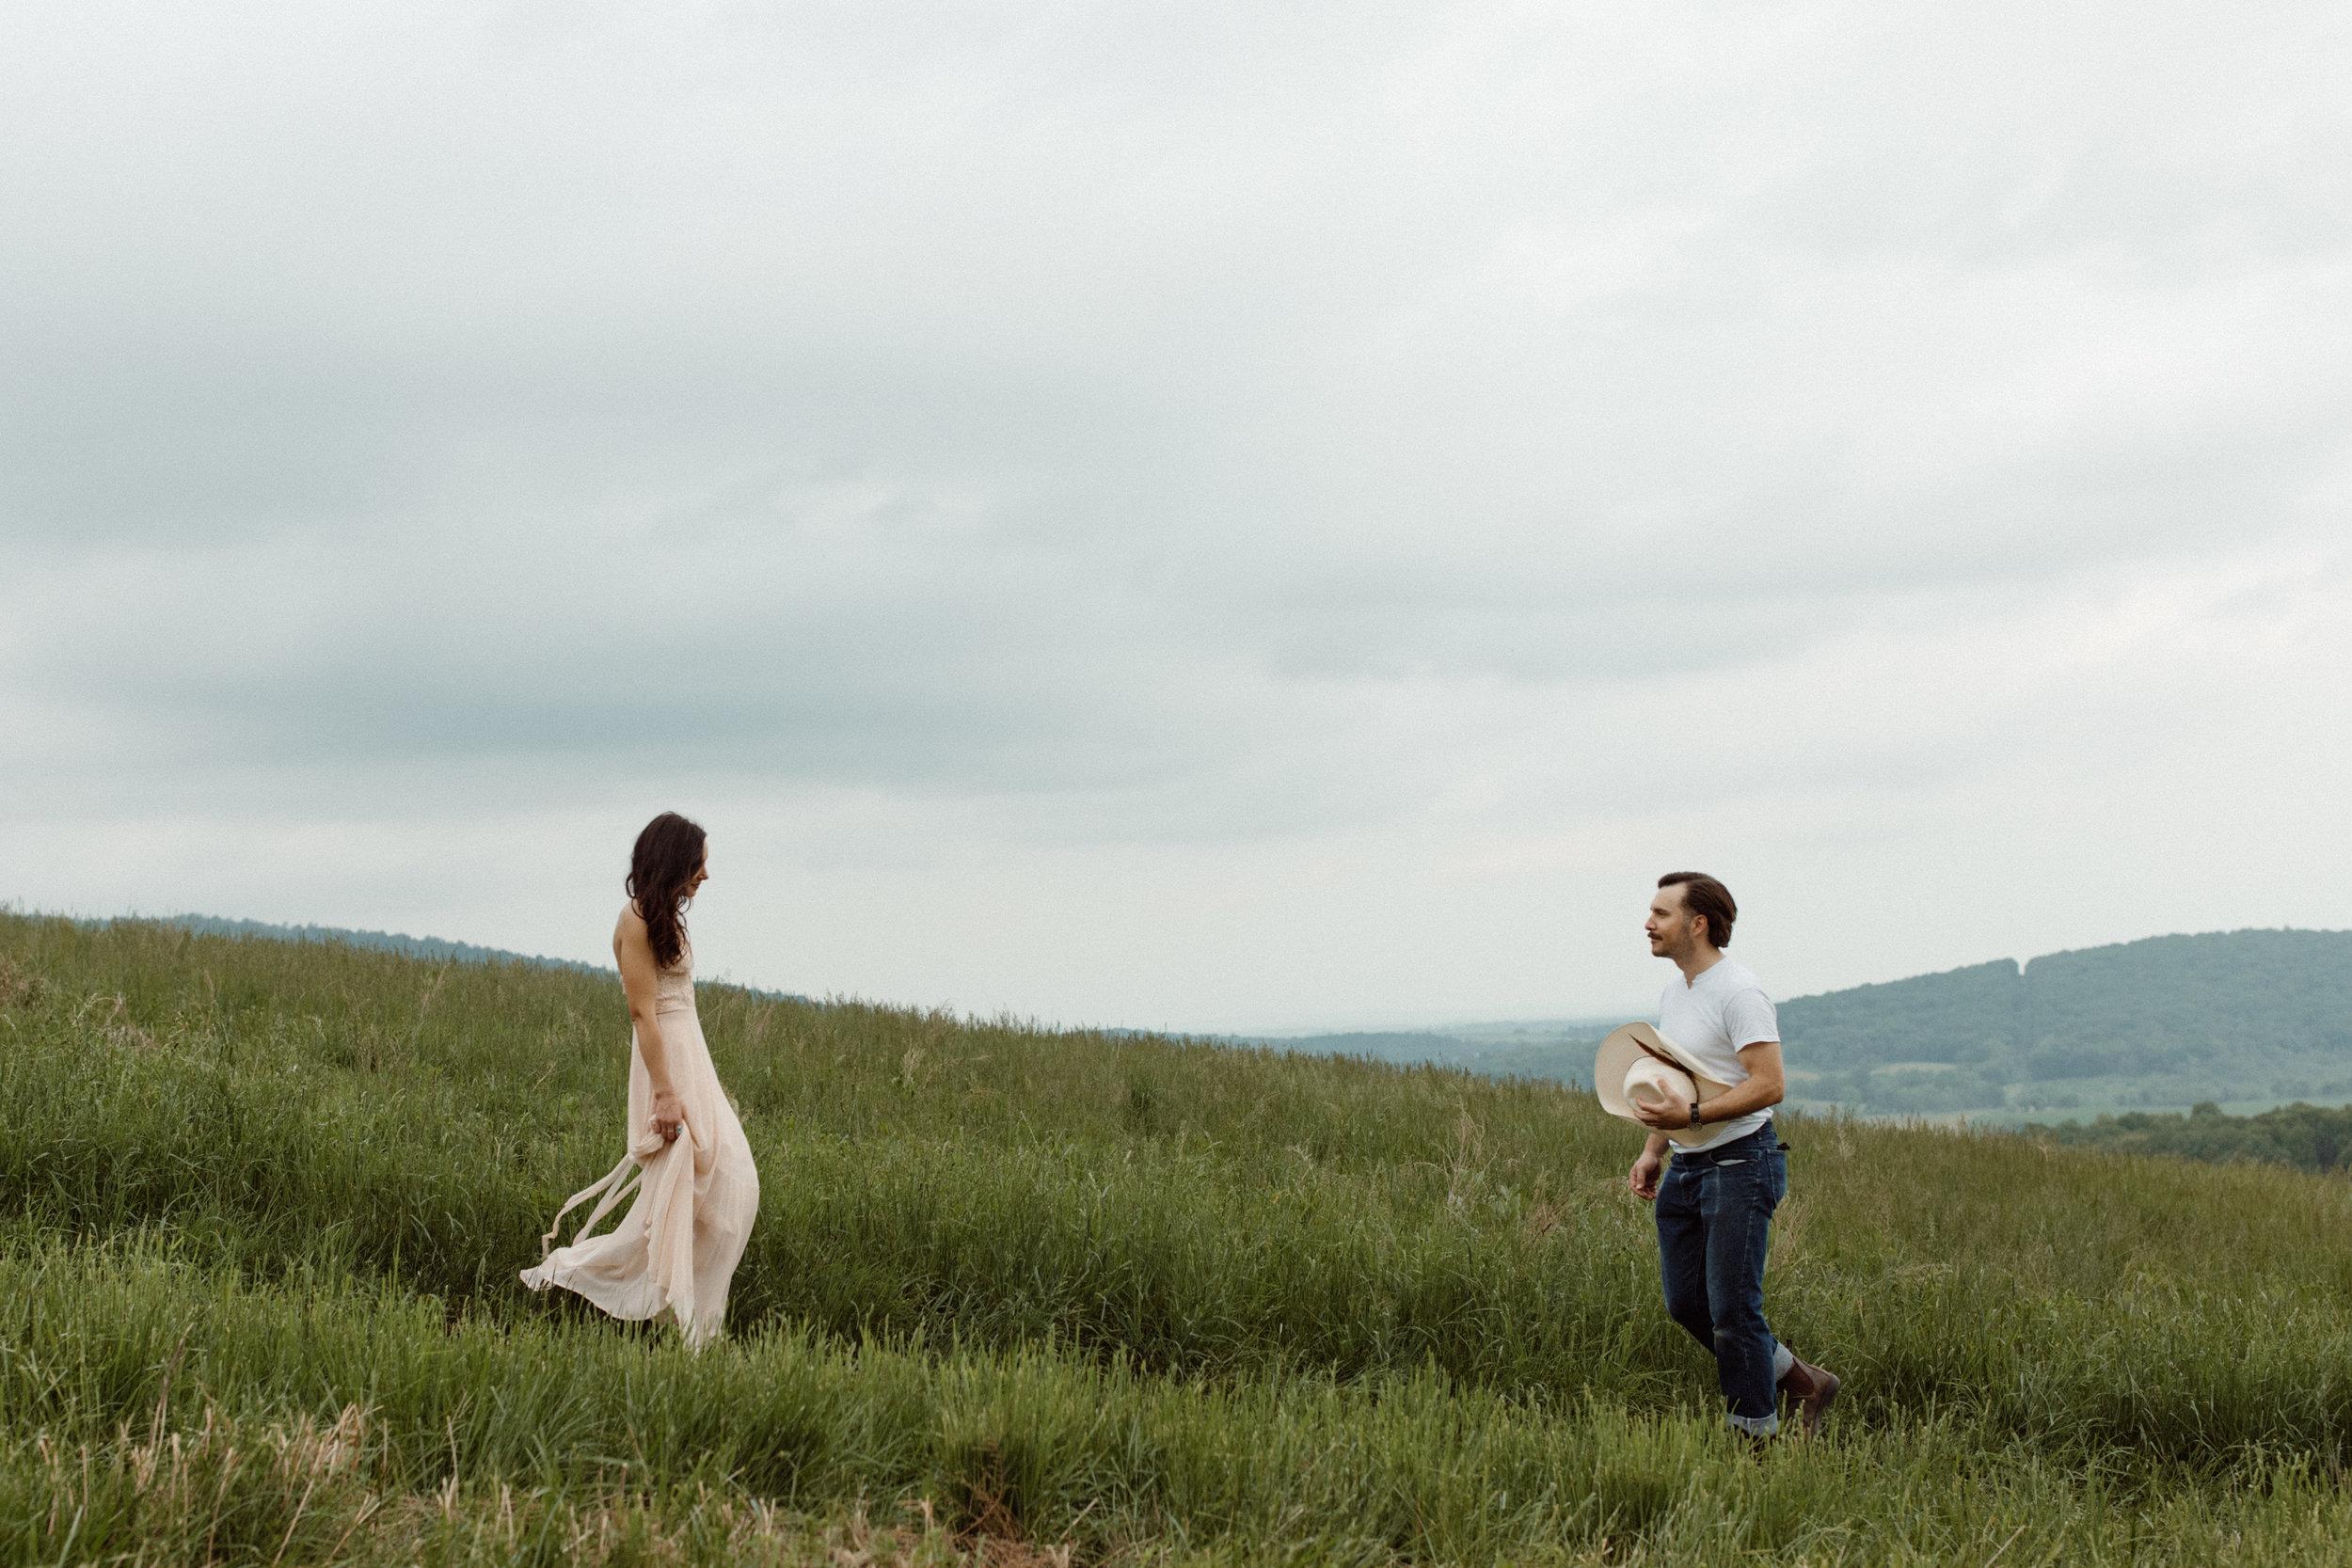 kelsey&mark-engagement-skymeadows-2019-peytoncurry-9215.jpg